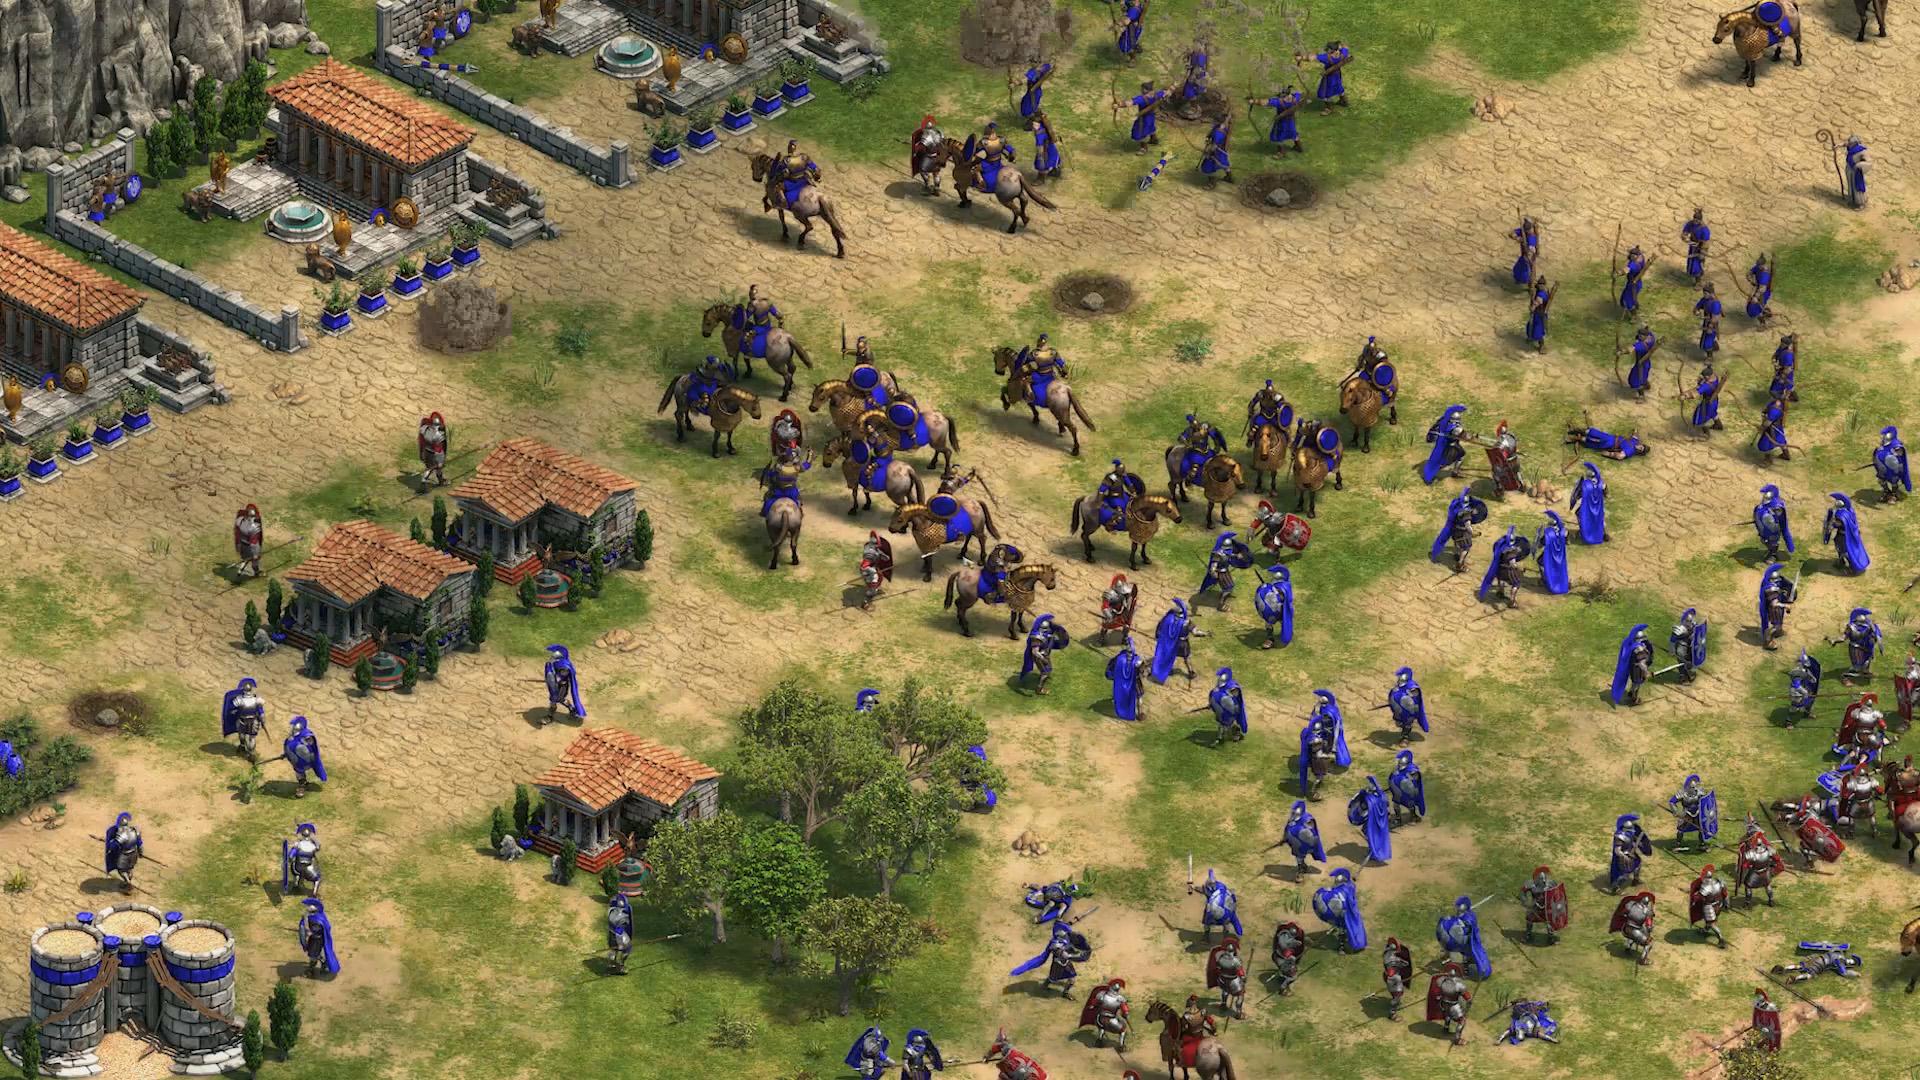 Age of Empires: DE - after